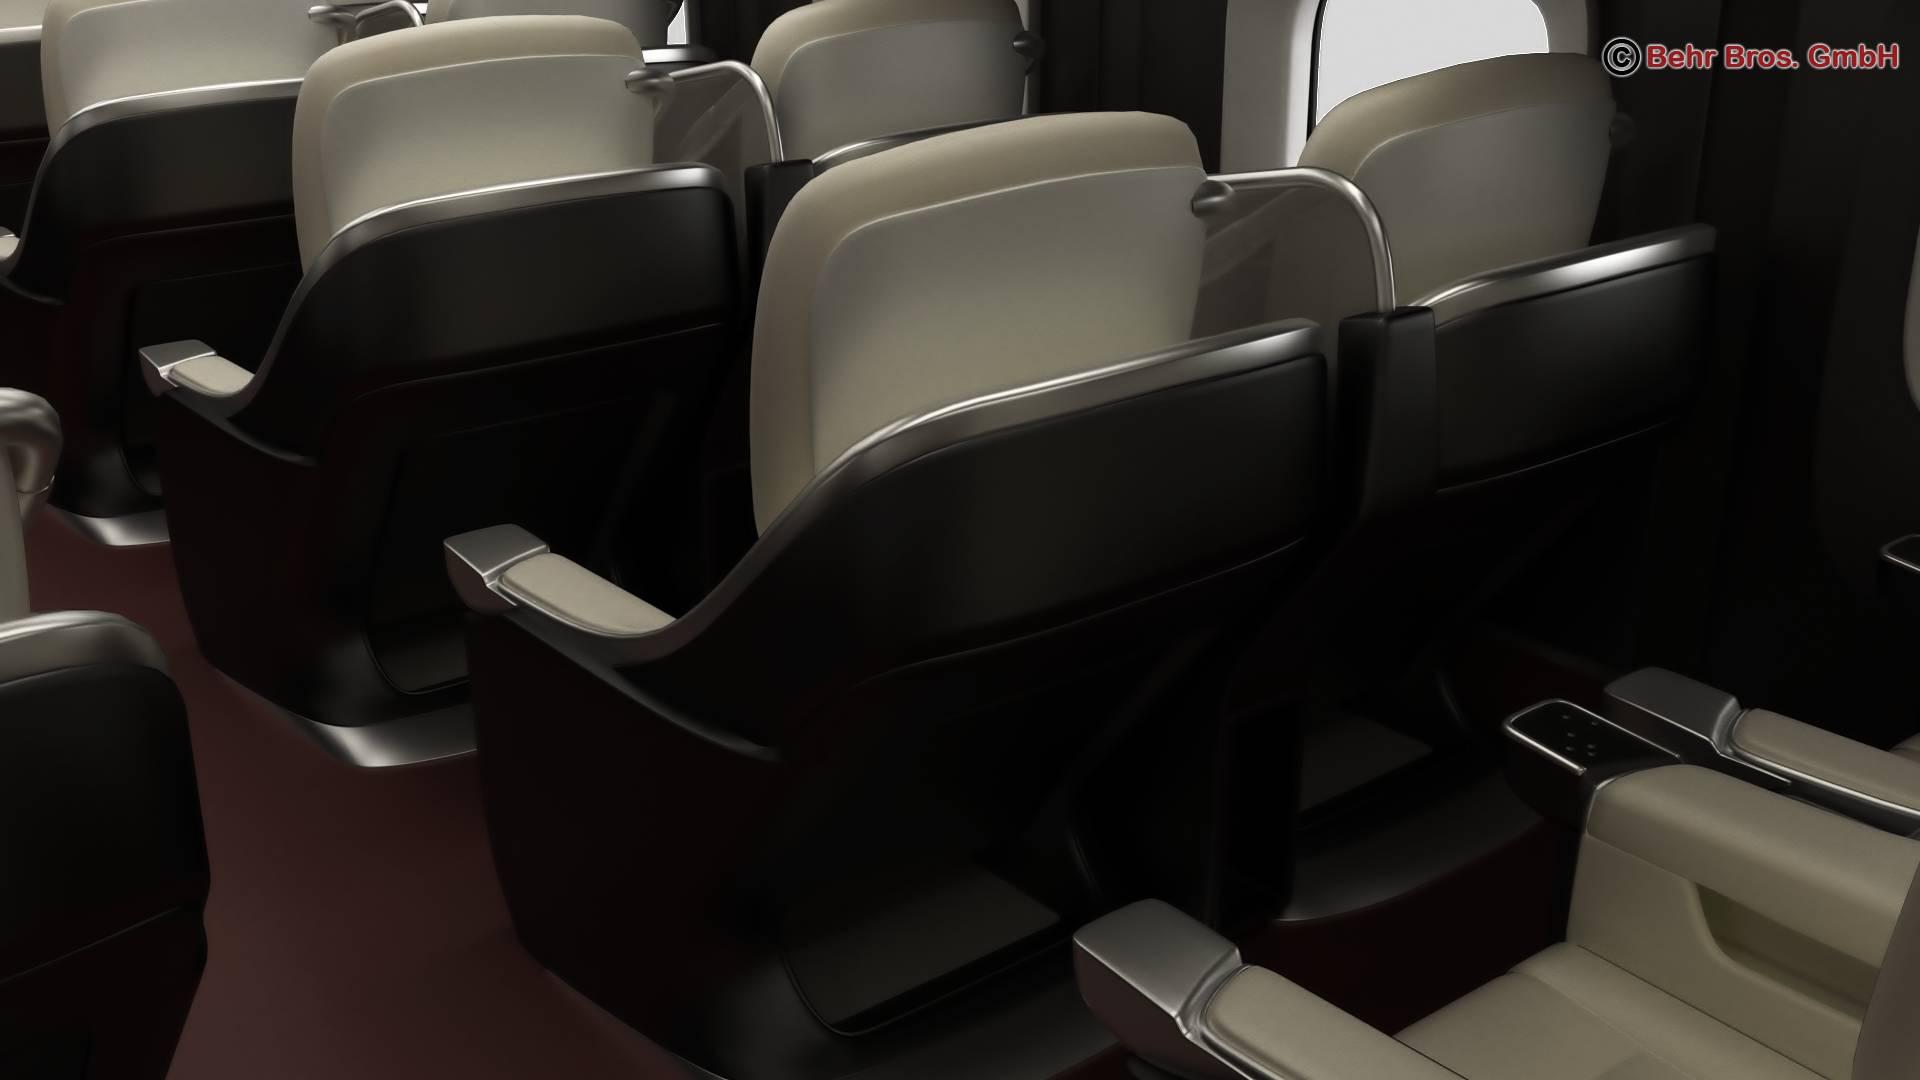 shinkansen e7 3d model 3ds max fbx c4d lwo ma mb obj 265666